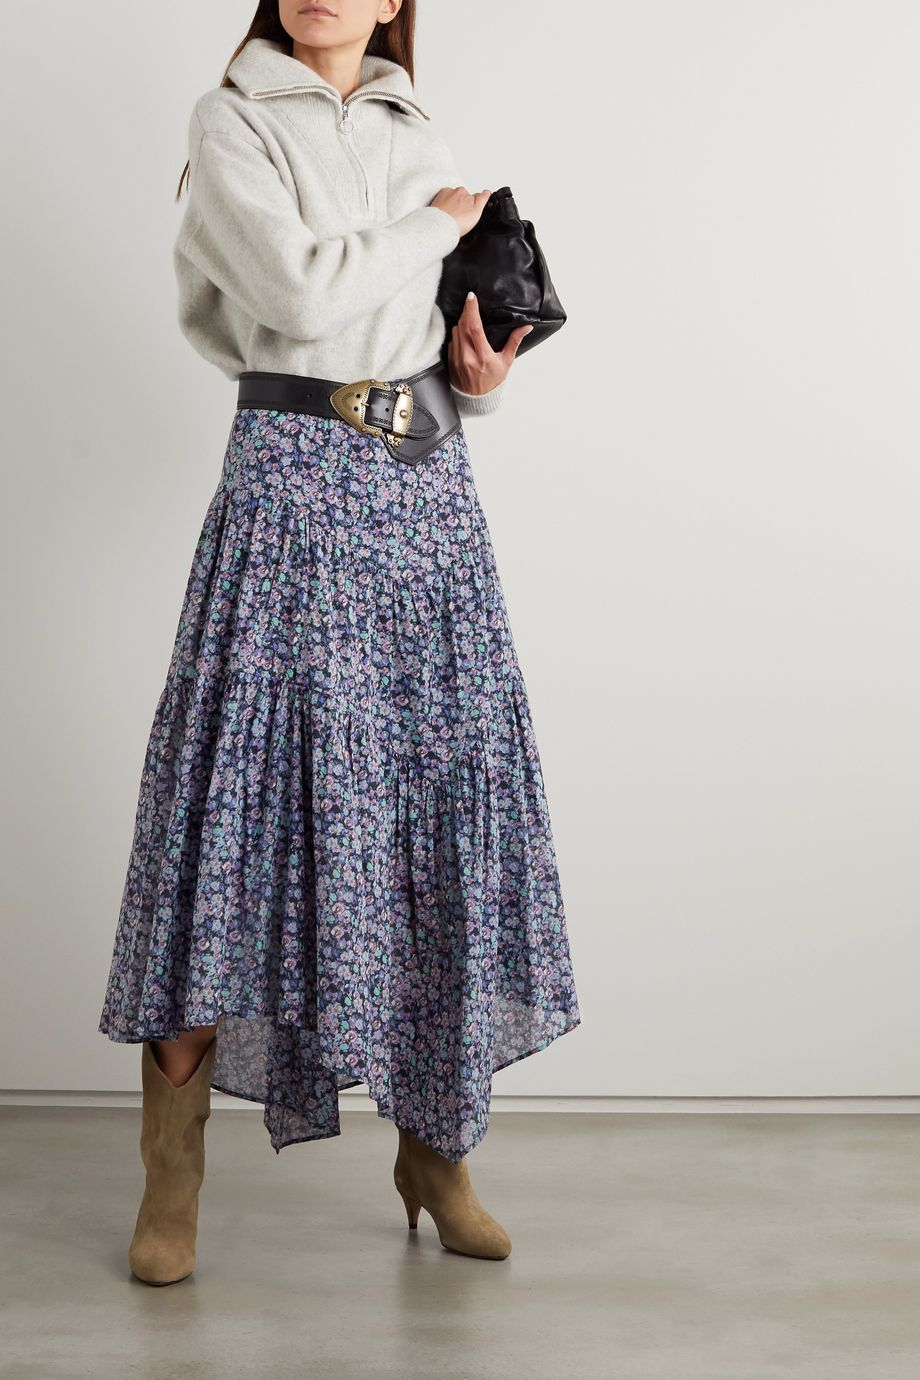 Isabel Marant Étoile Pabna asymmetrischer Midirock aus Baumwoll-Voile mit Blumenprint